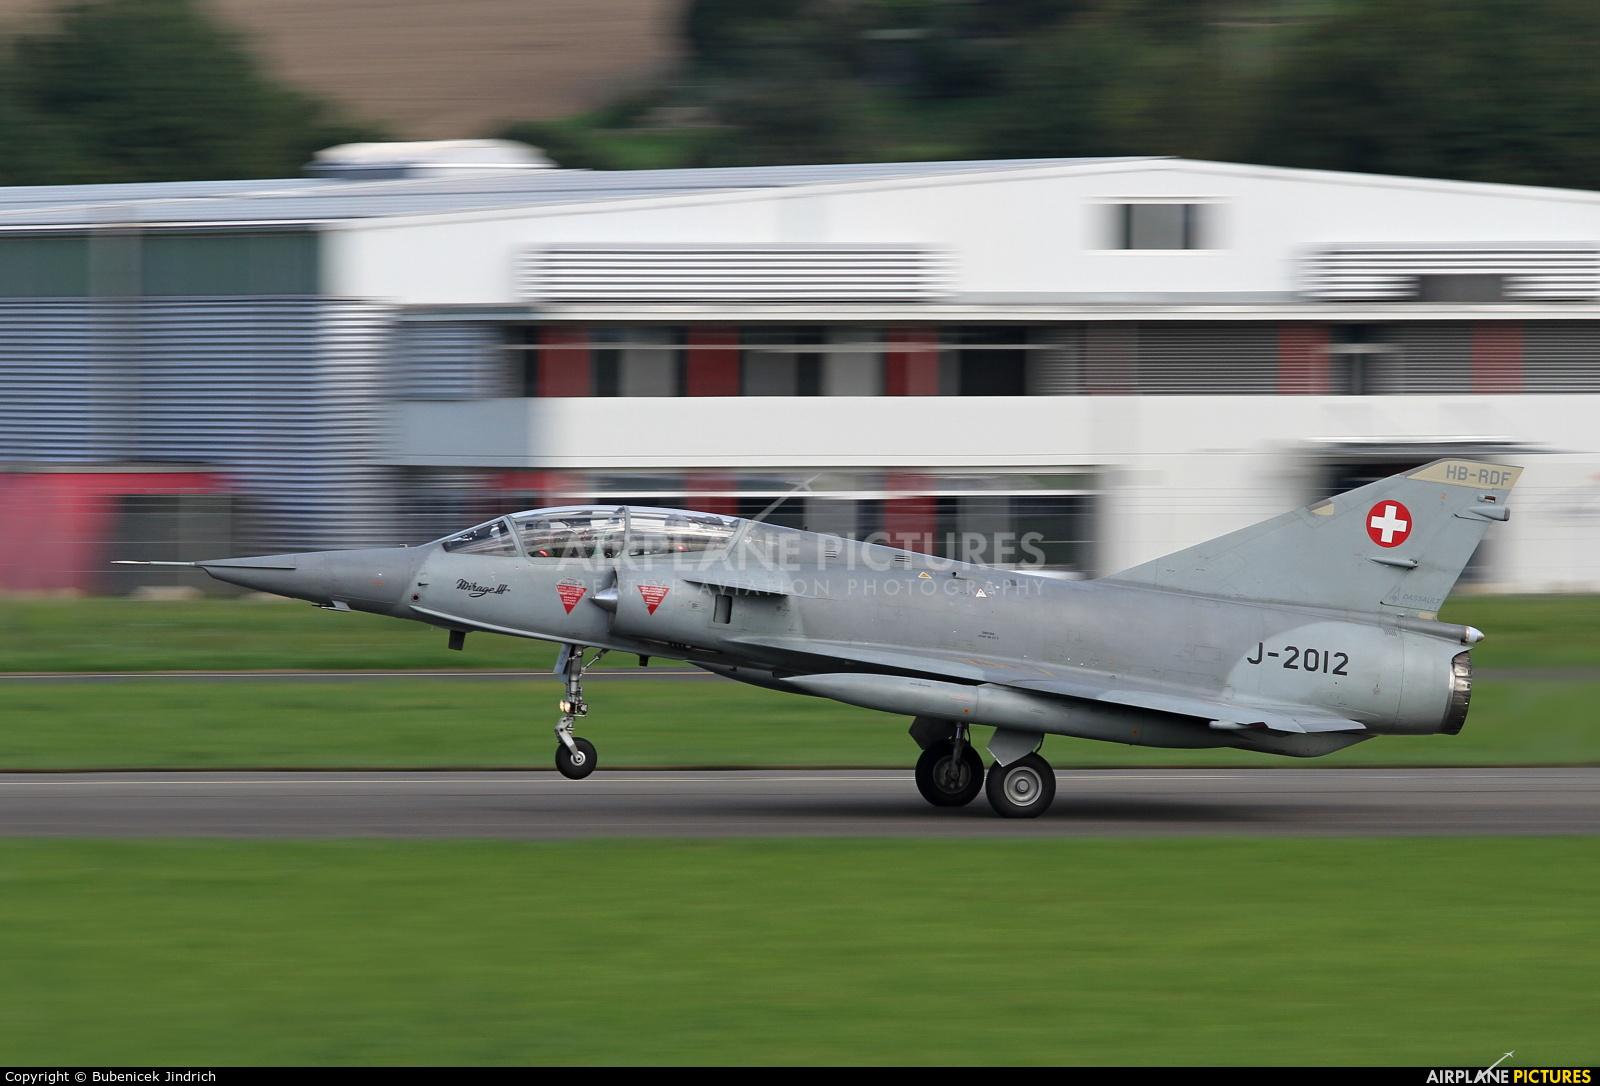 Switzerland - Air Force J-2012 aircraft at Payerne